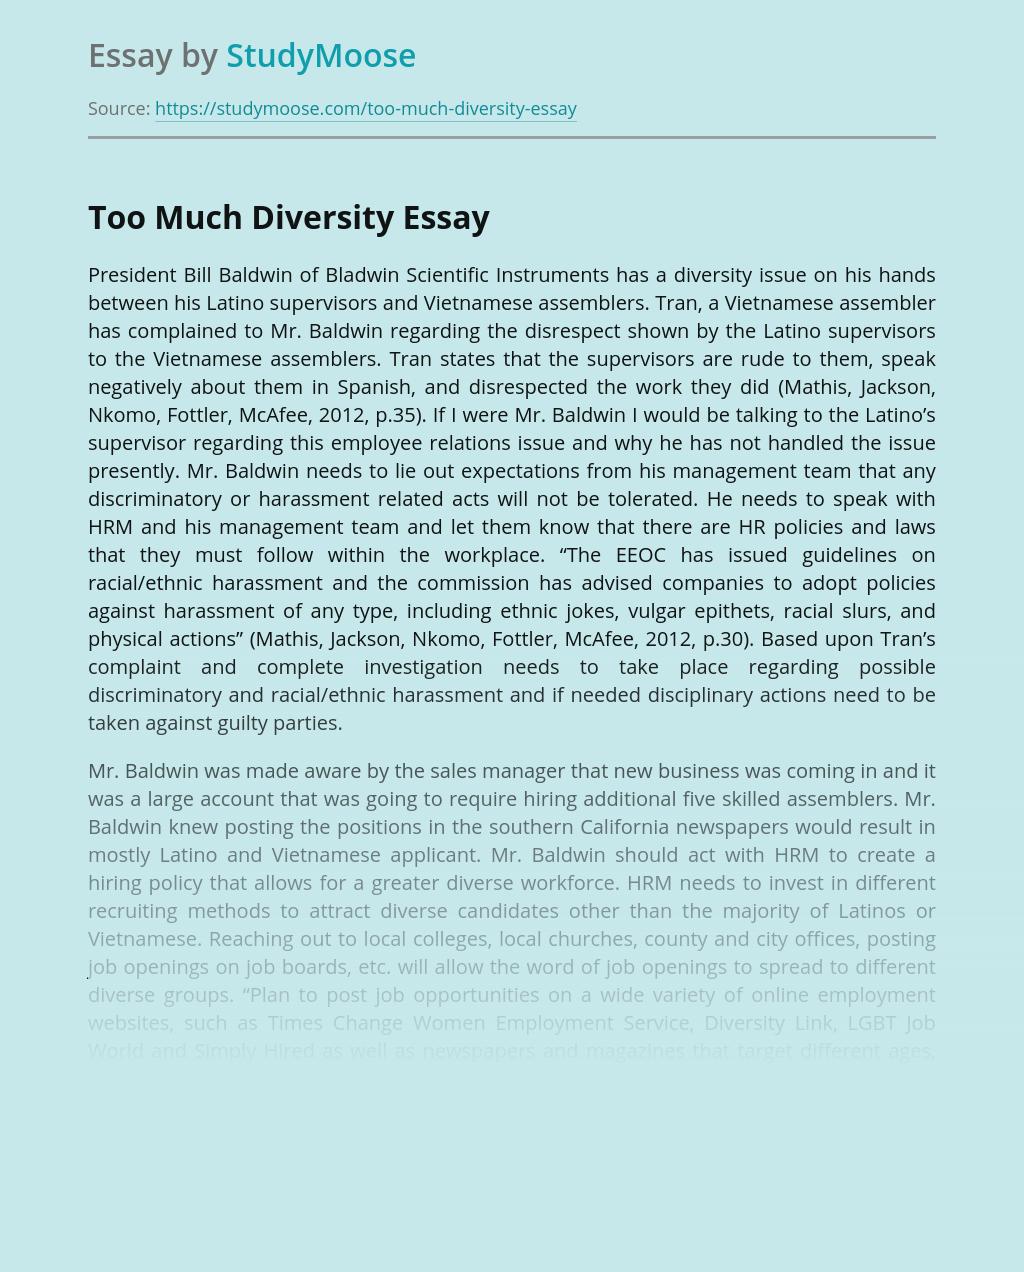 Too Much Diversity